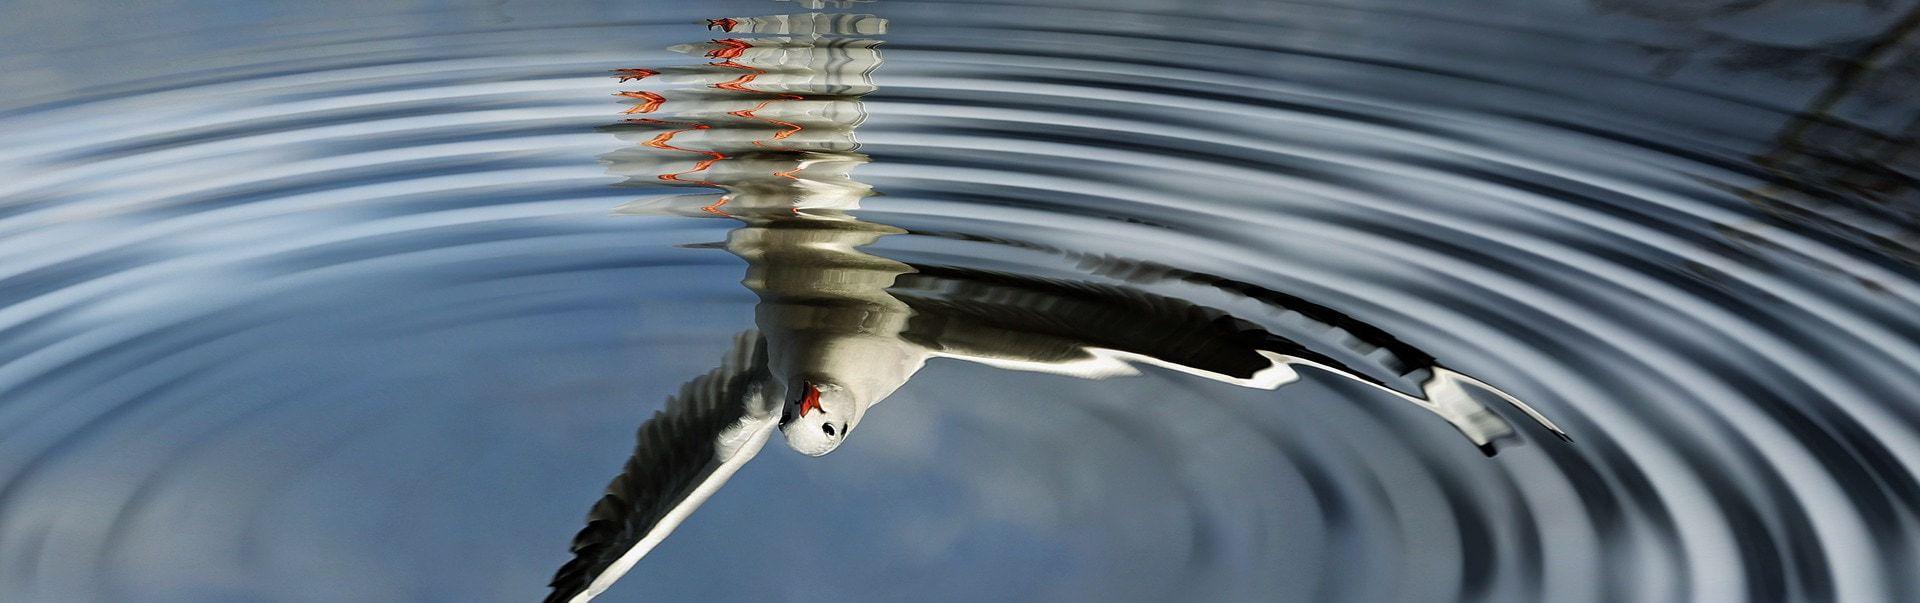 birds-1105286_1920